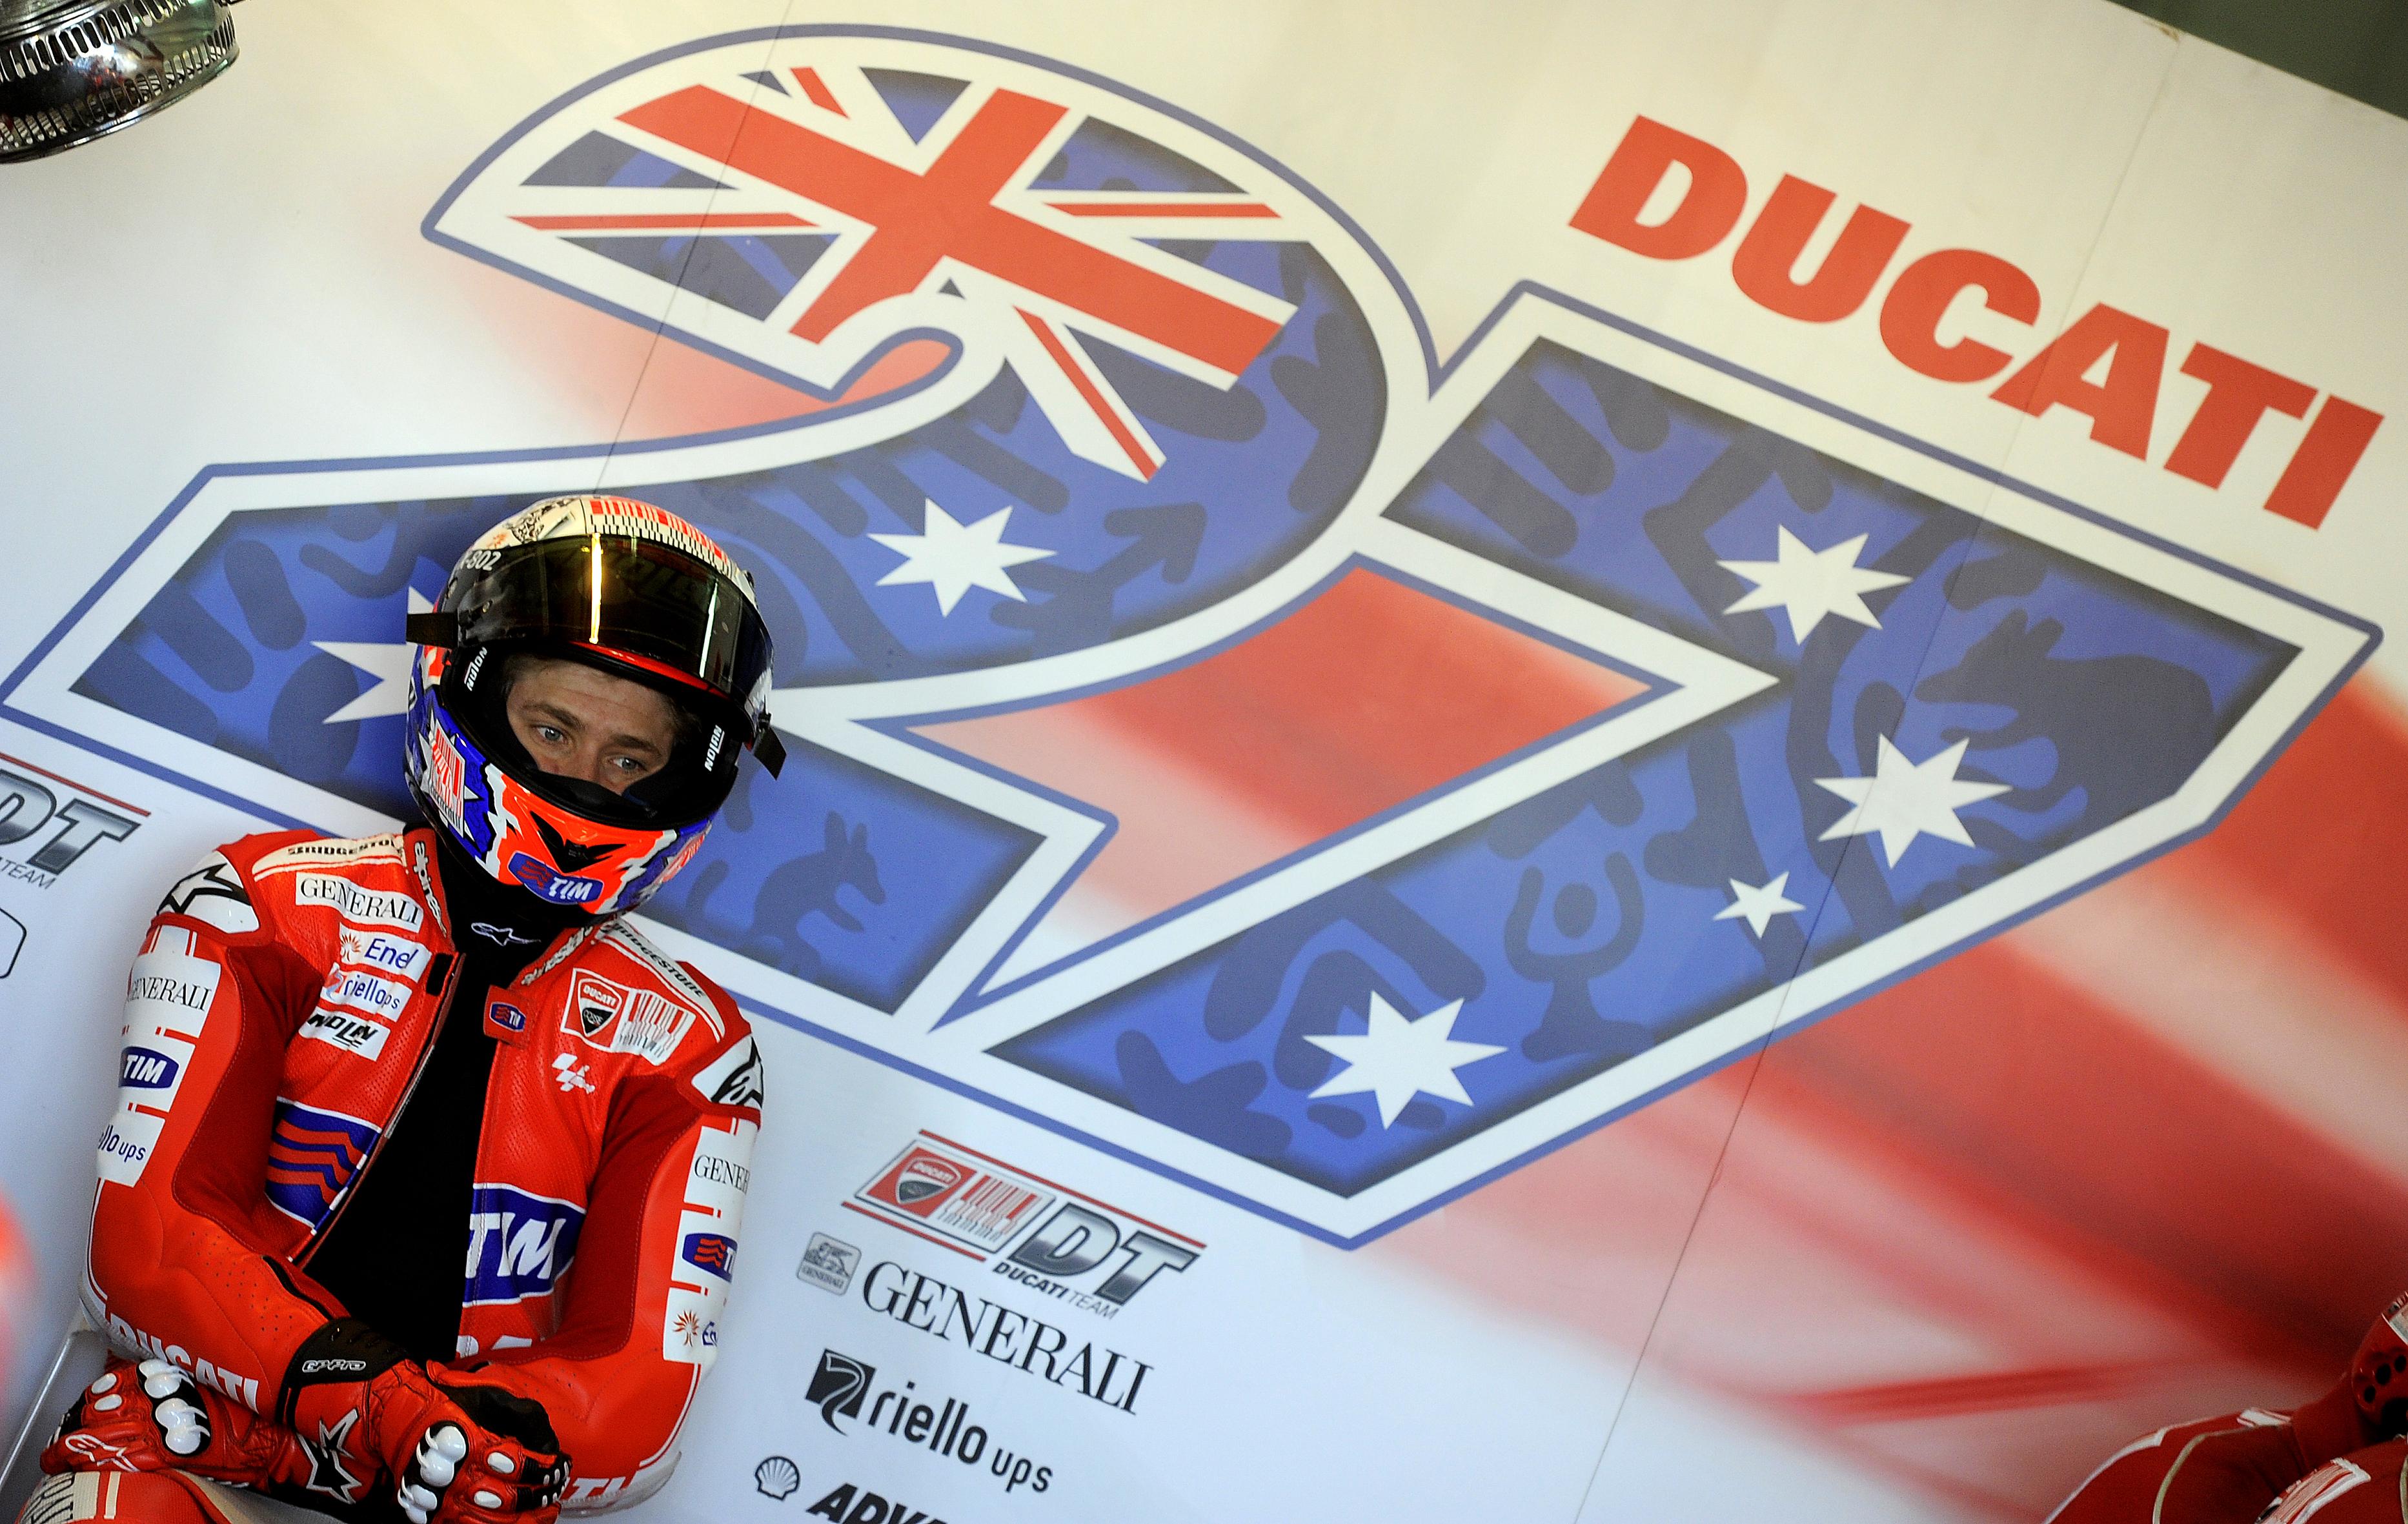 Ducati confirm Casey Stoner's return